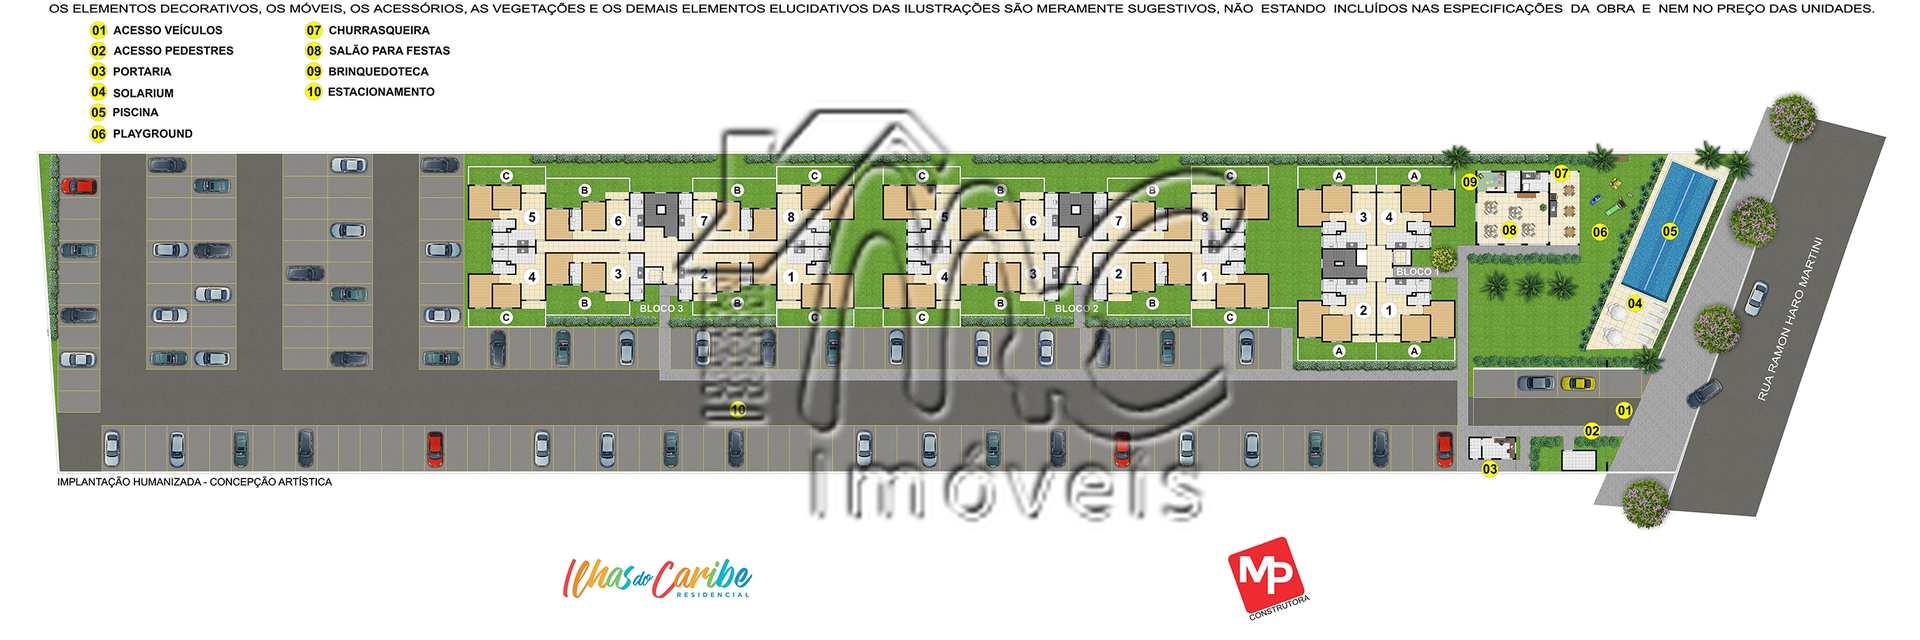 Apartamento com 2 dorms, Vila Haro, Sorocaba - R$ 159 mil.